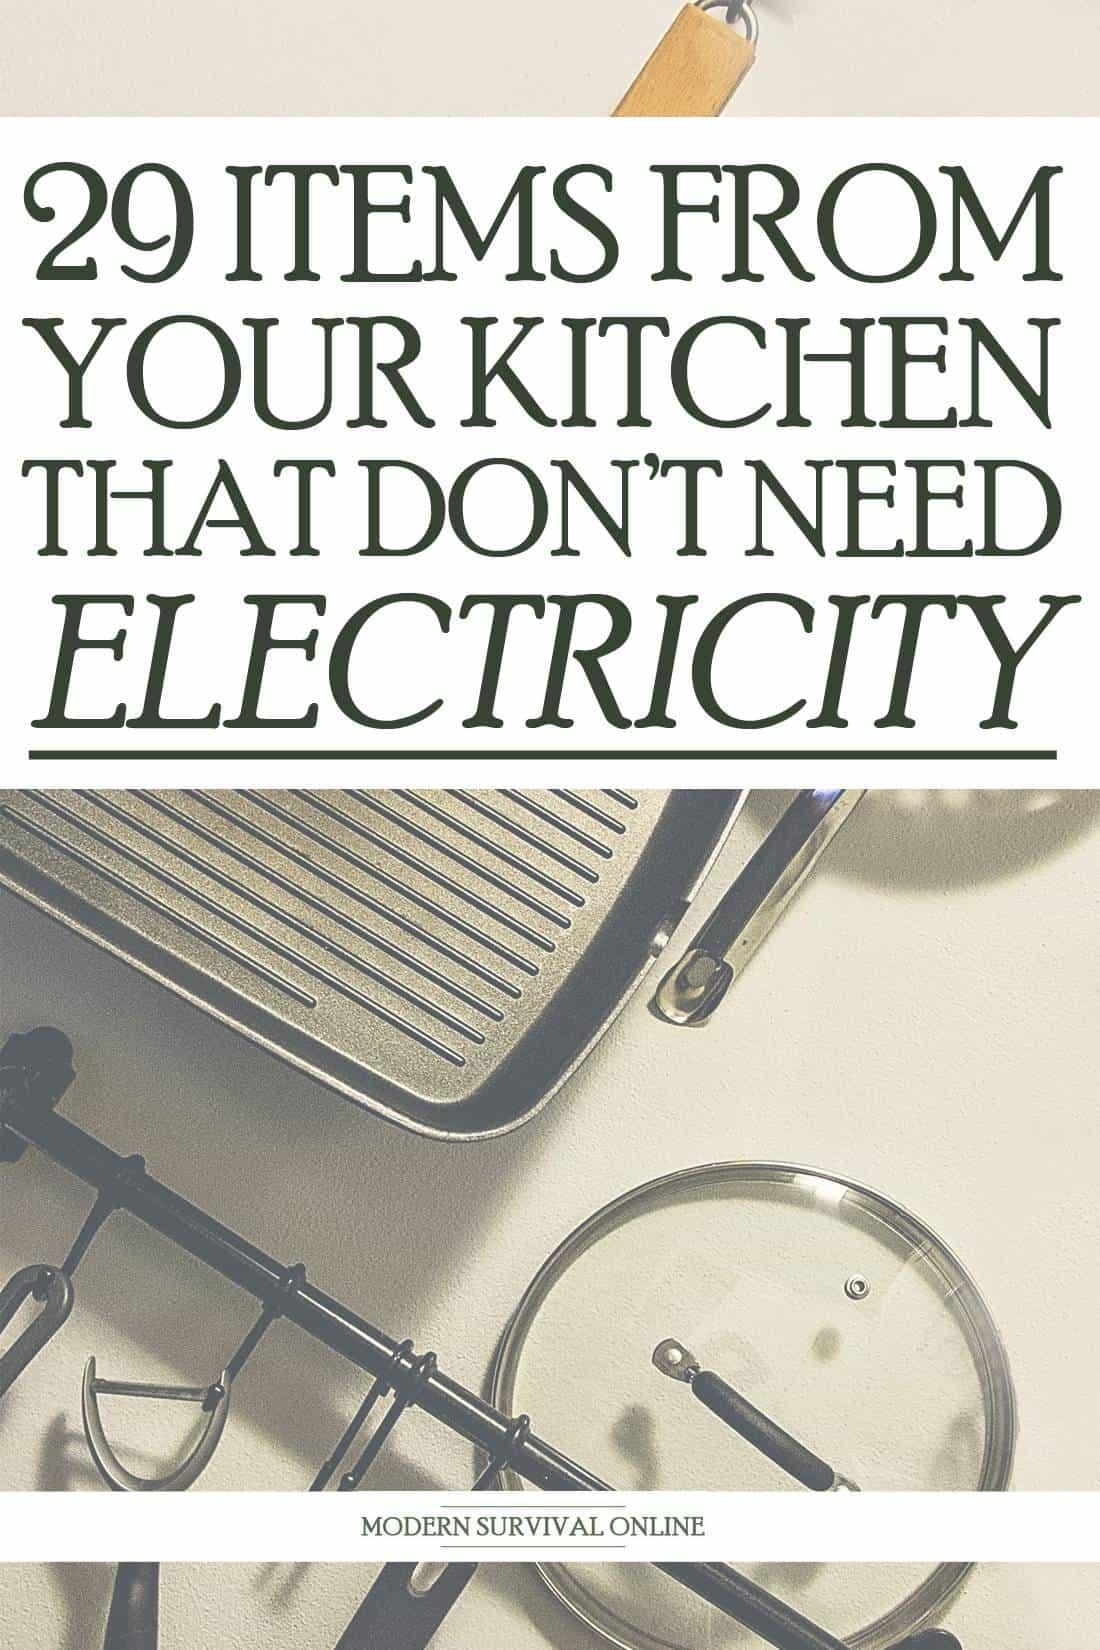 manual kitchen items pin image